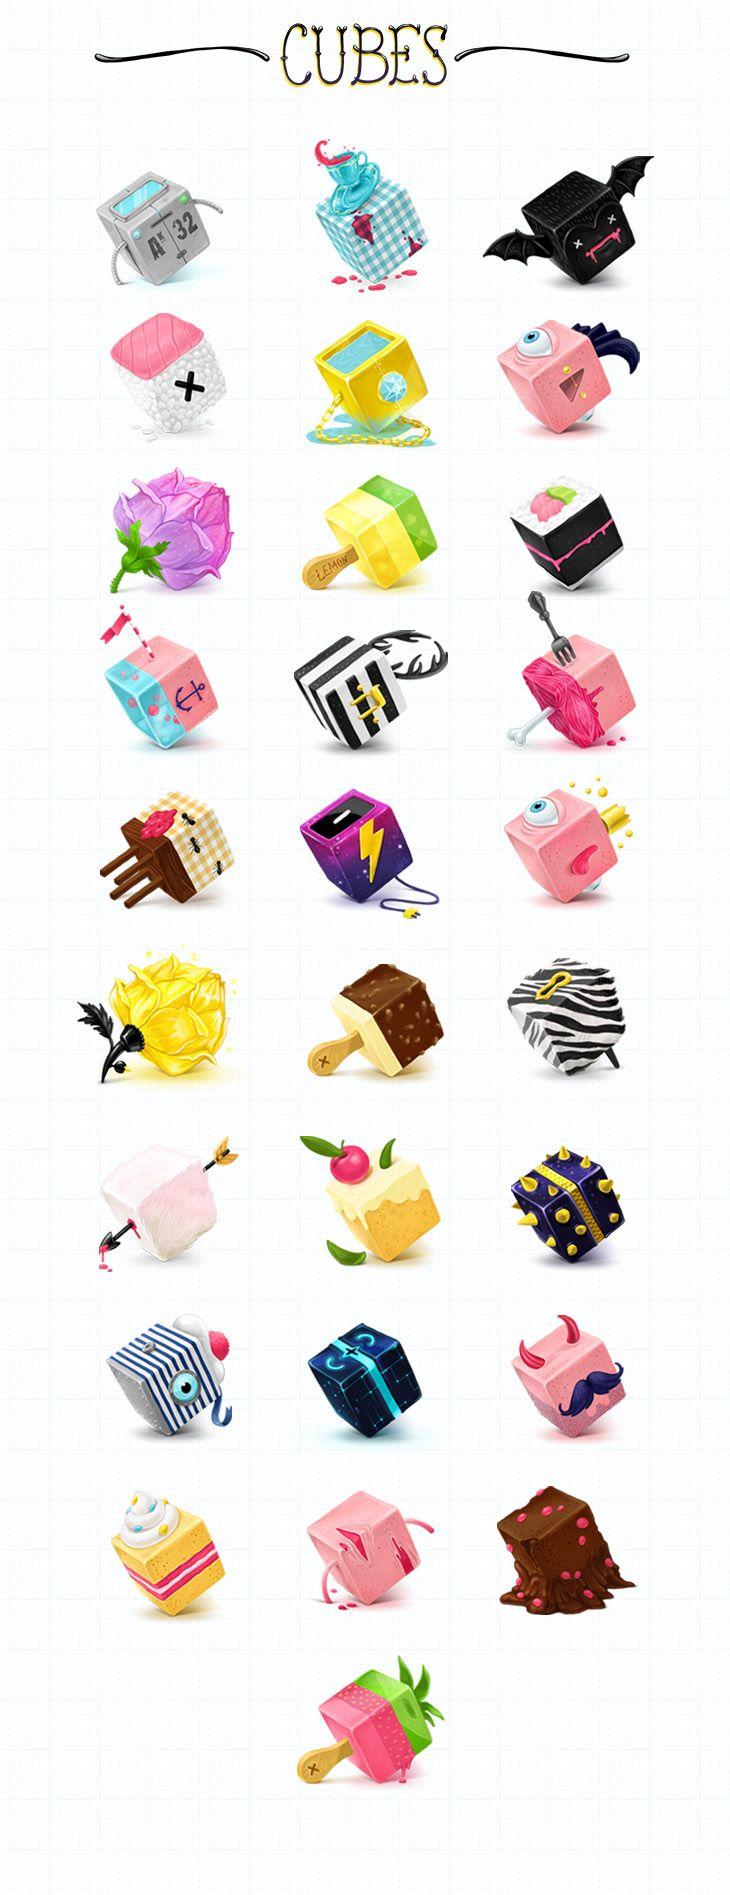 Kluke Art icon sets and additional